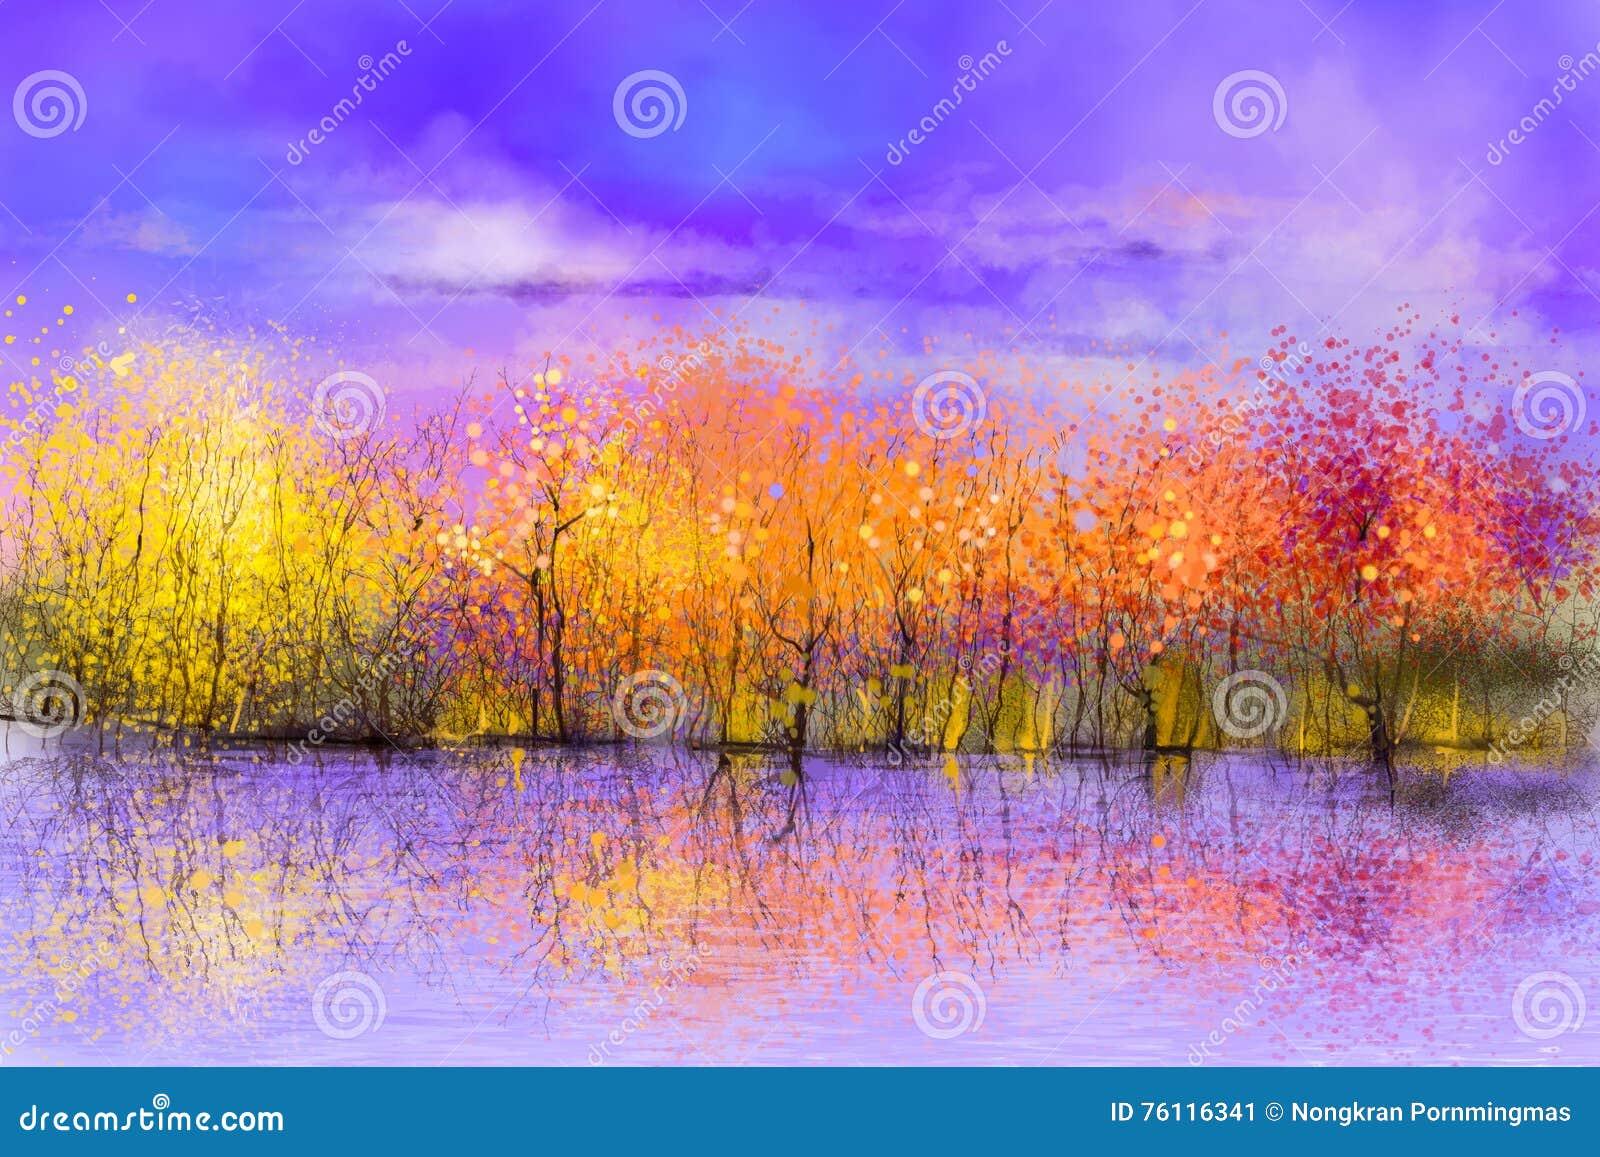 fond color de paysage d 39 automne de peinture l 39 huile illustration stock illustration du. Black Bedroom Furniture Sets. Home Design Ideas